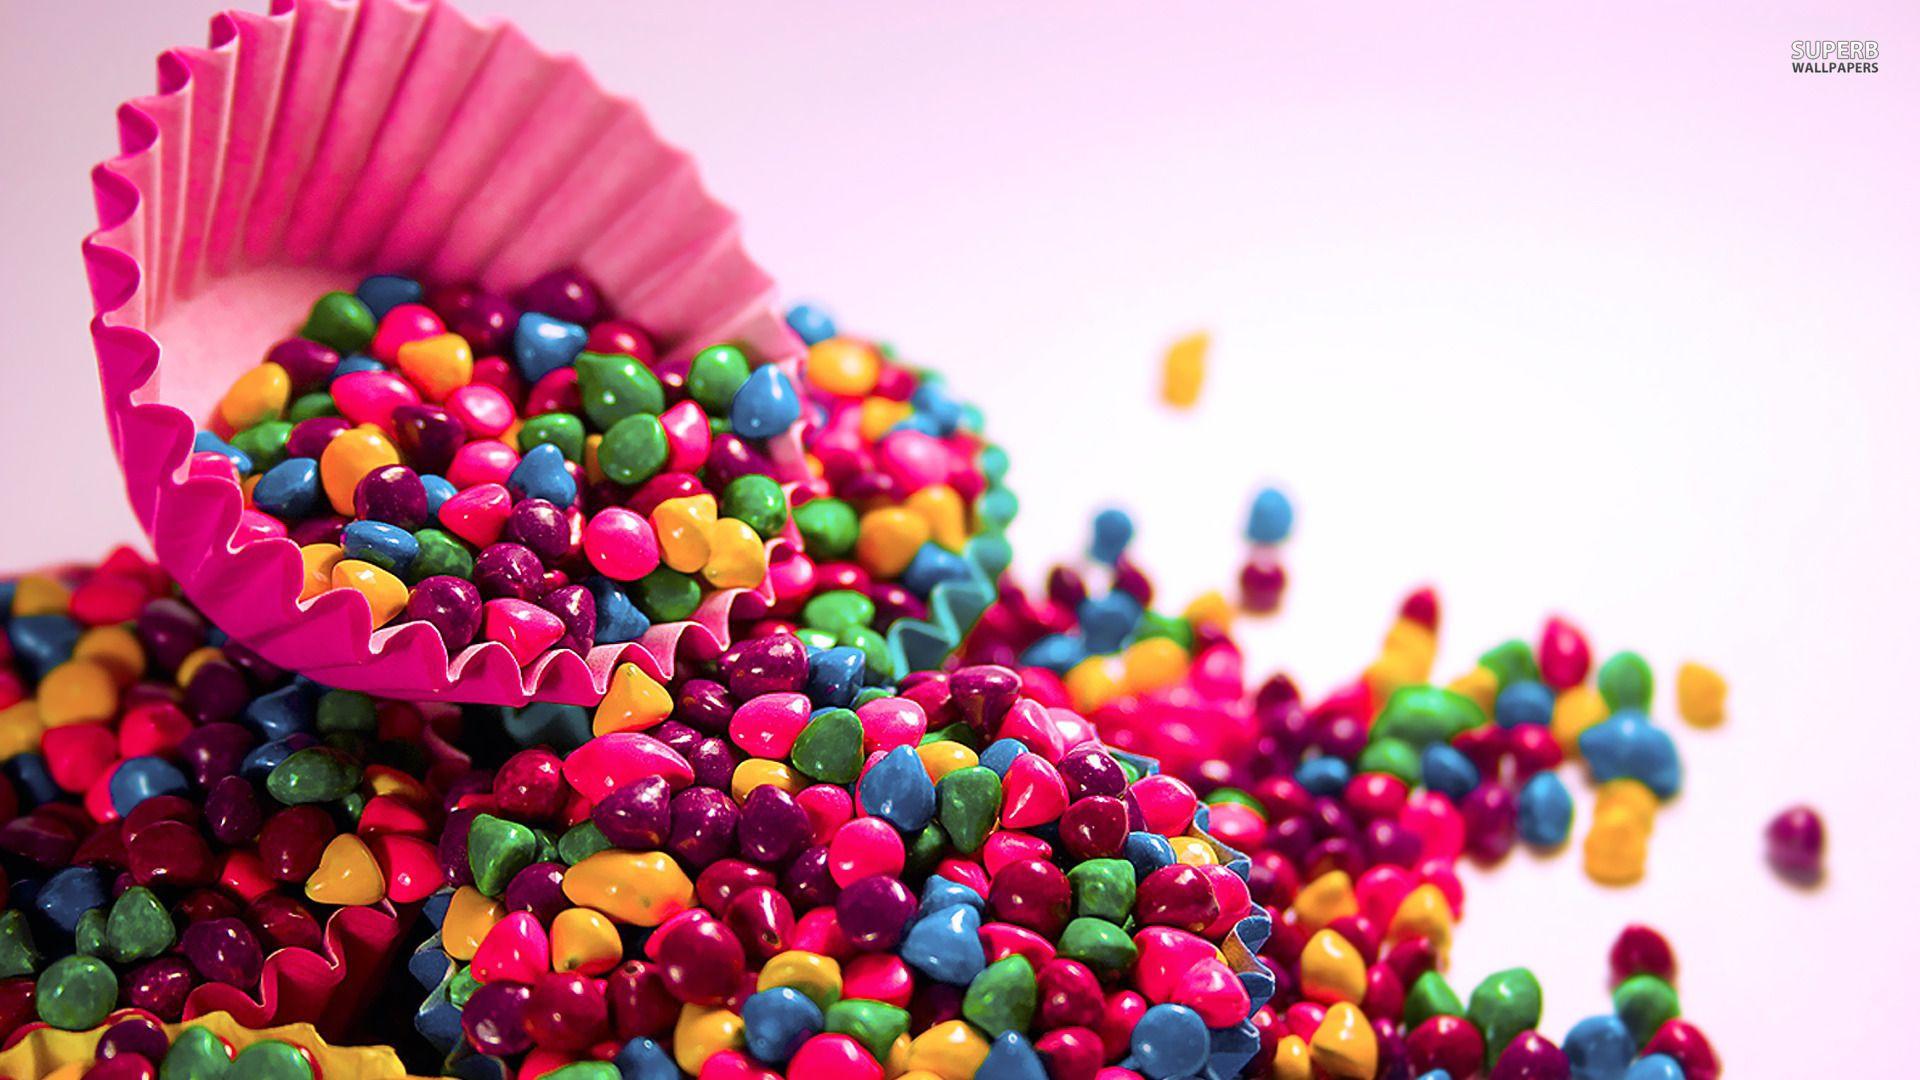 candy - Google 검색